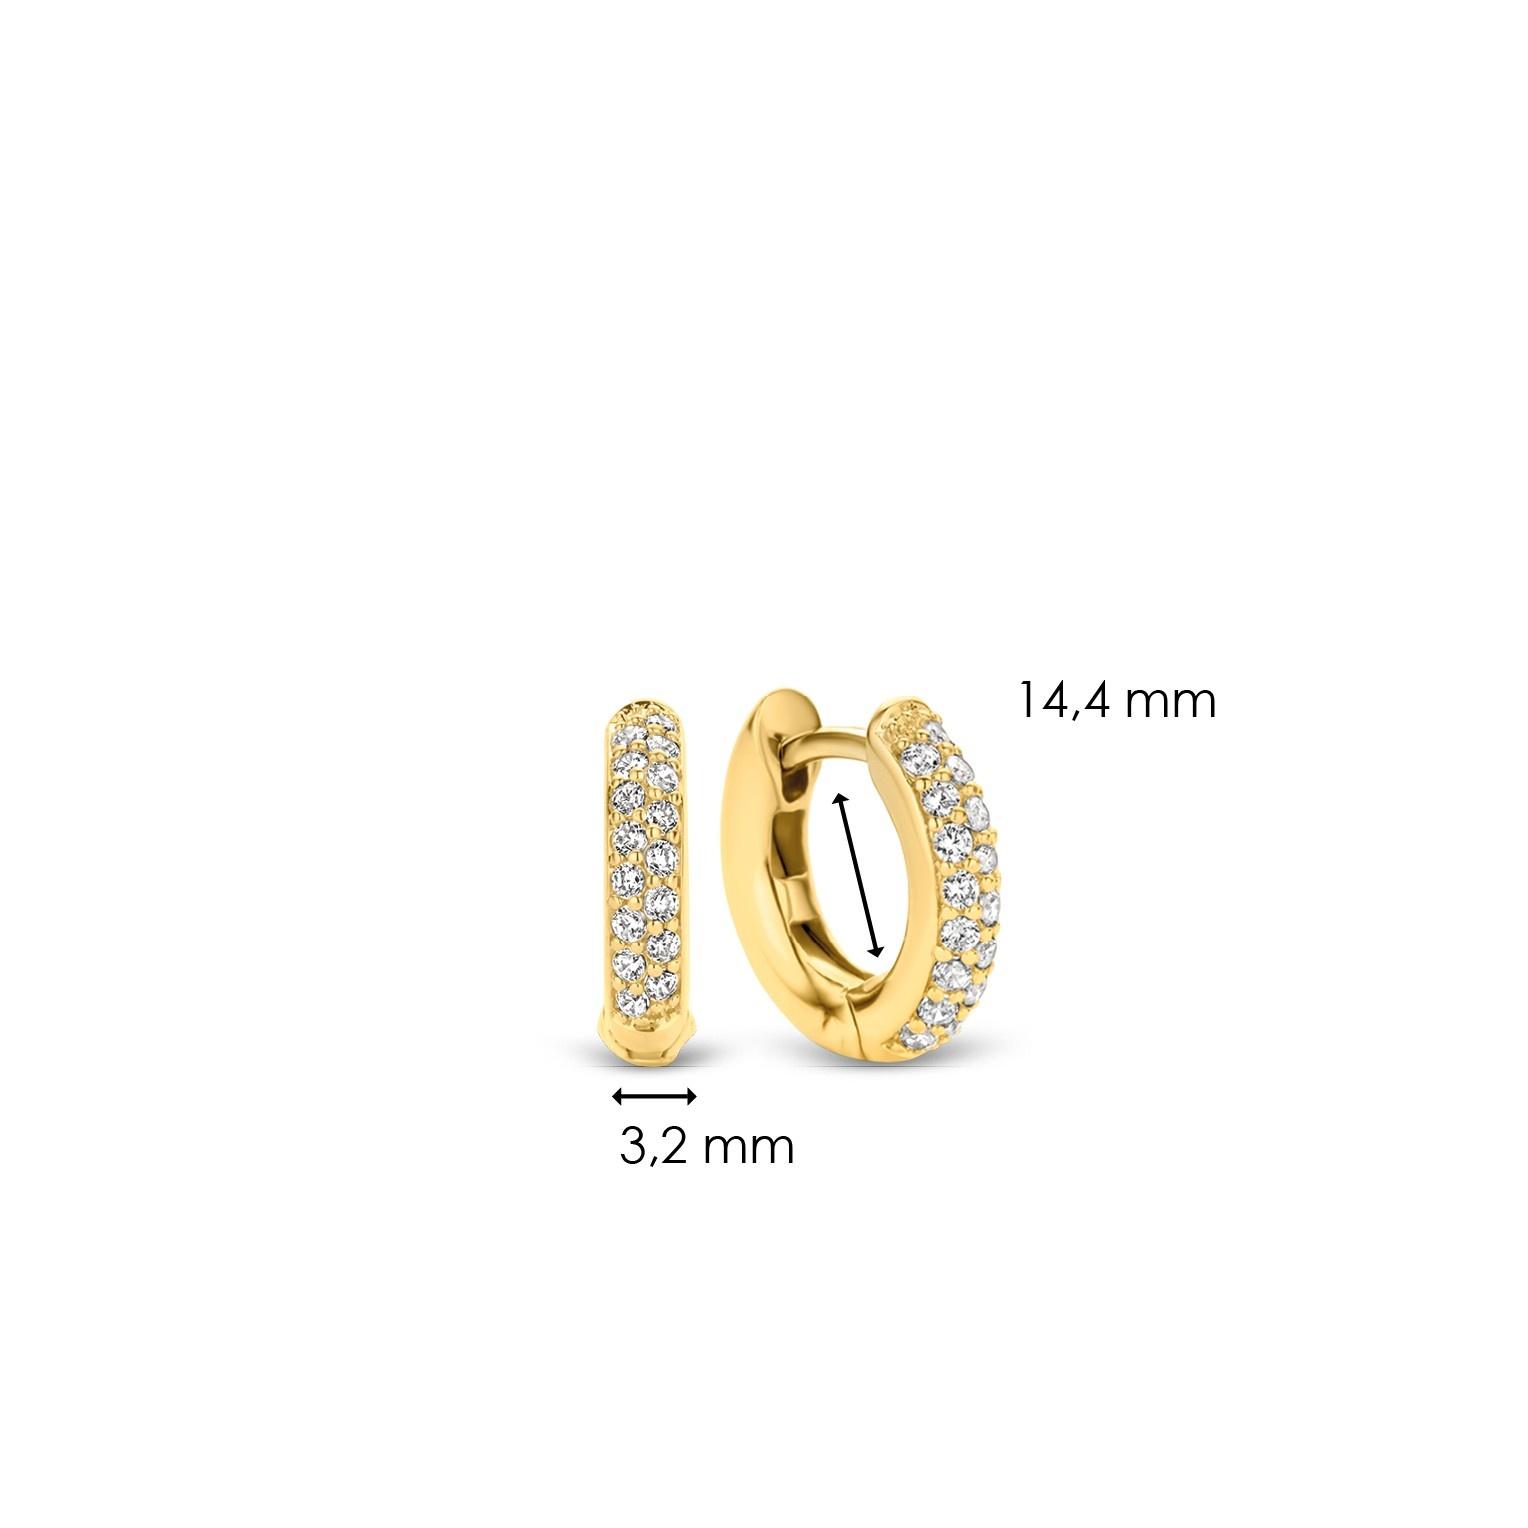 TI SENTO - Milano Earrings 7210ZY-4